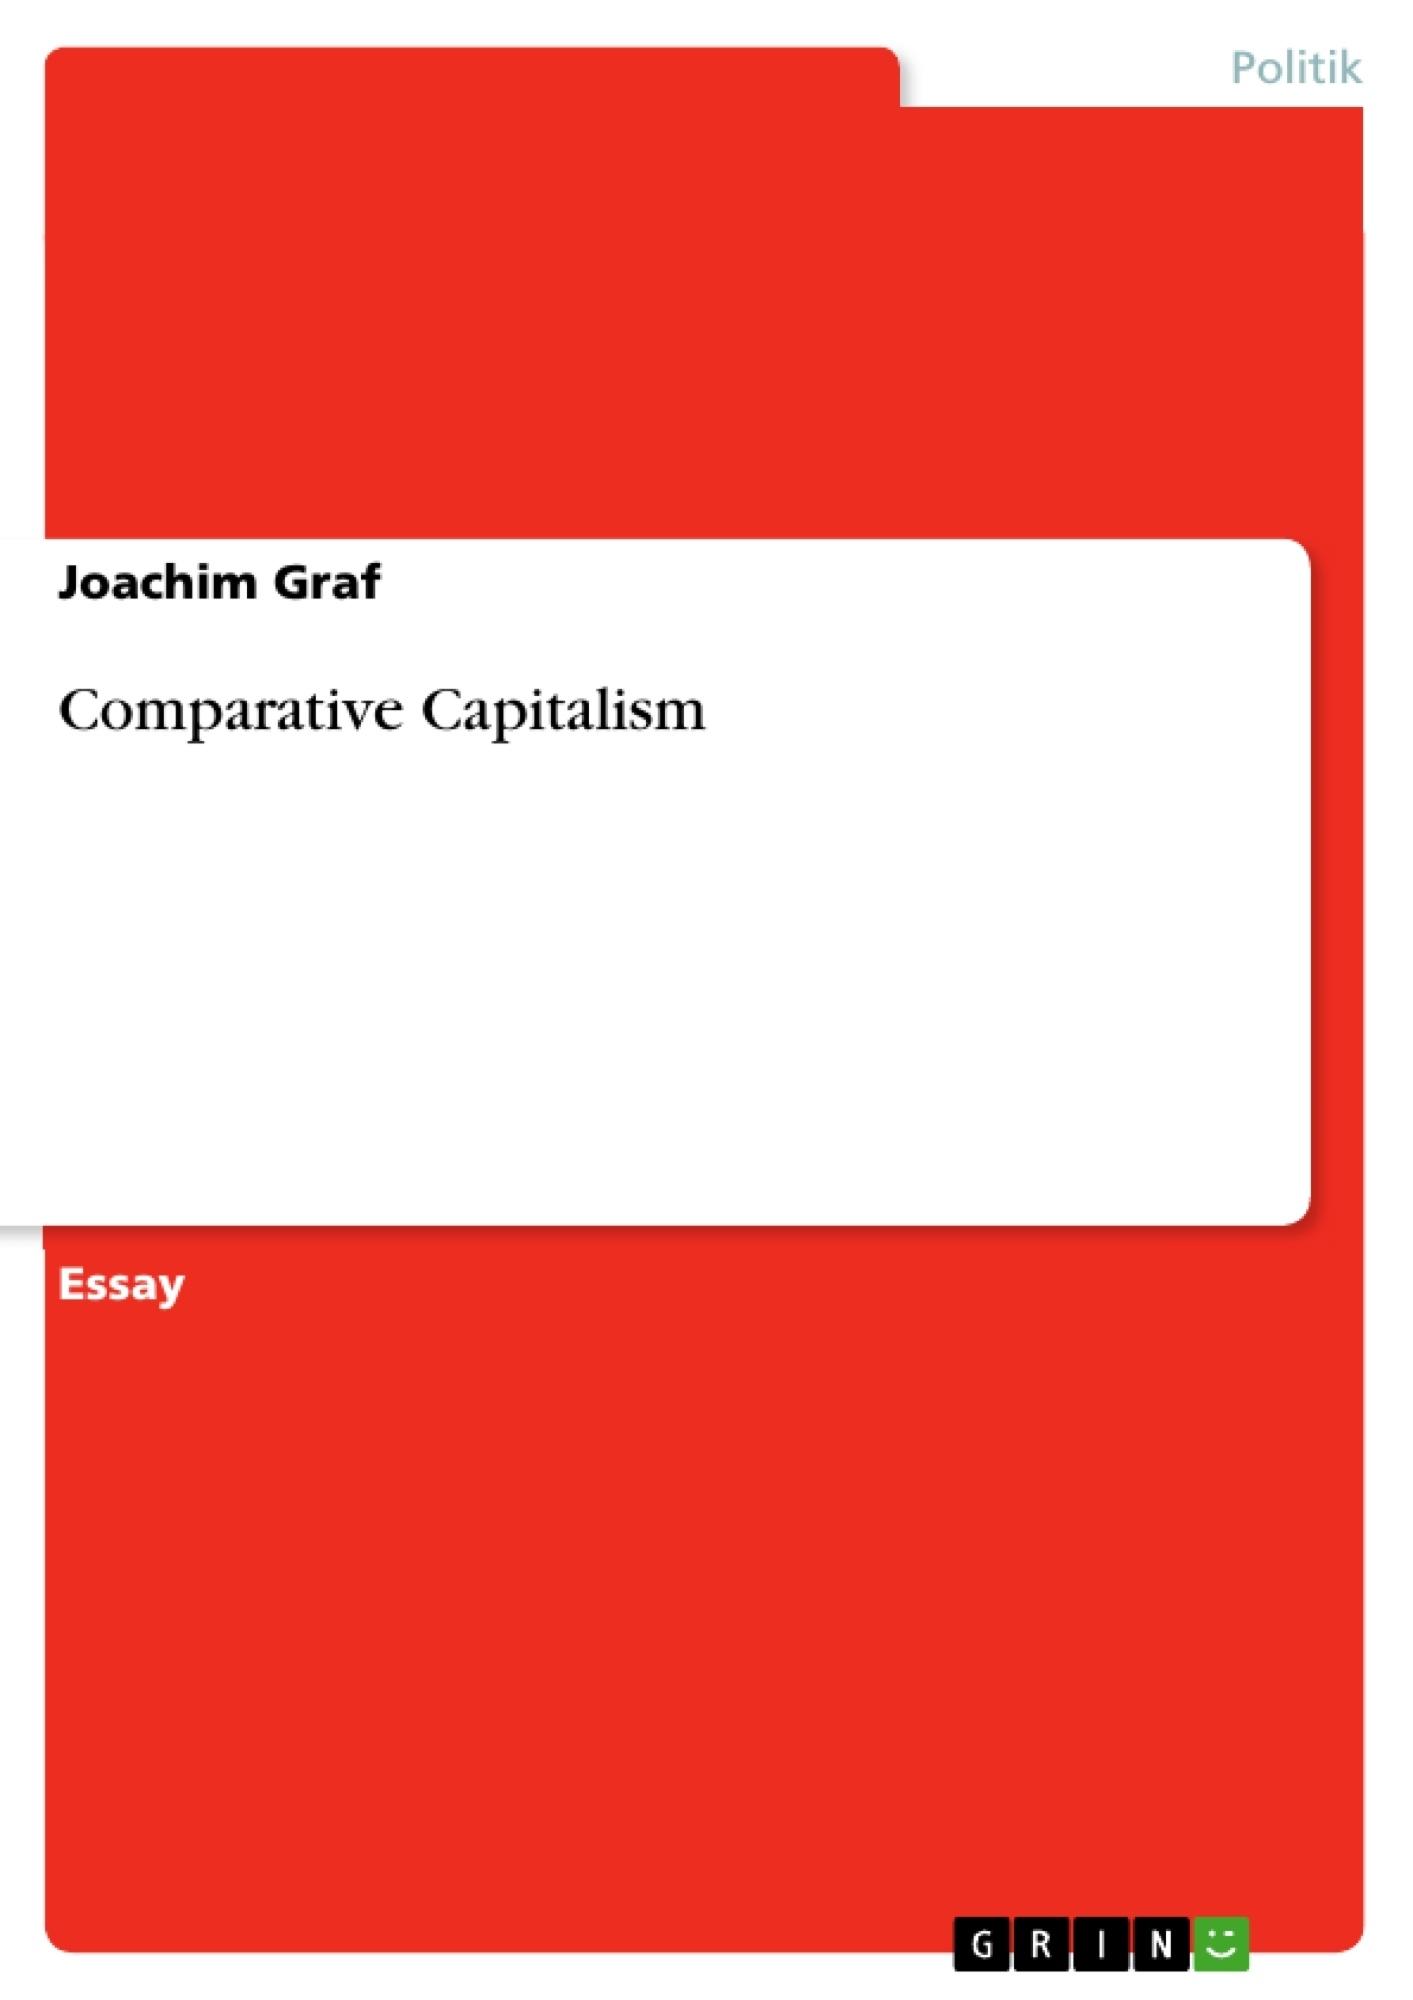 Titel: Comparative Capitalism